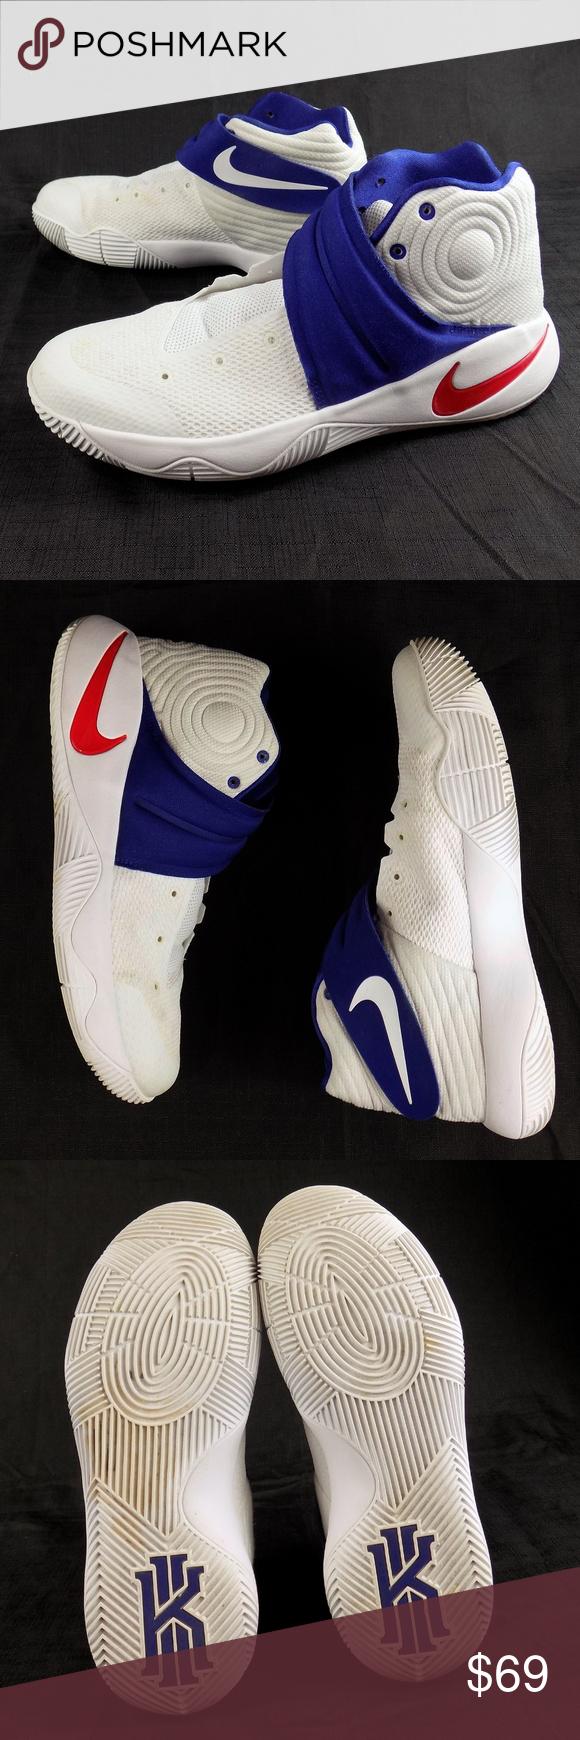 Nike Basketball Shoes Kyrie Irving 2